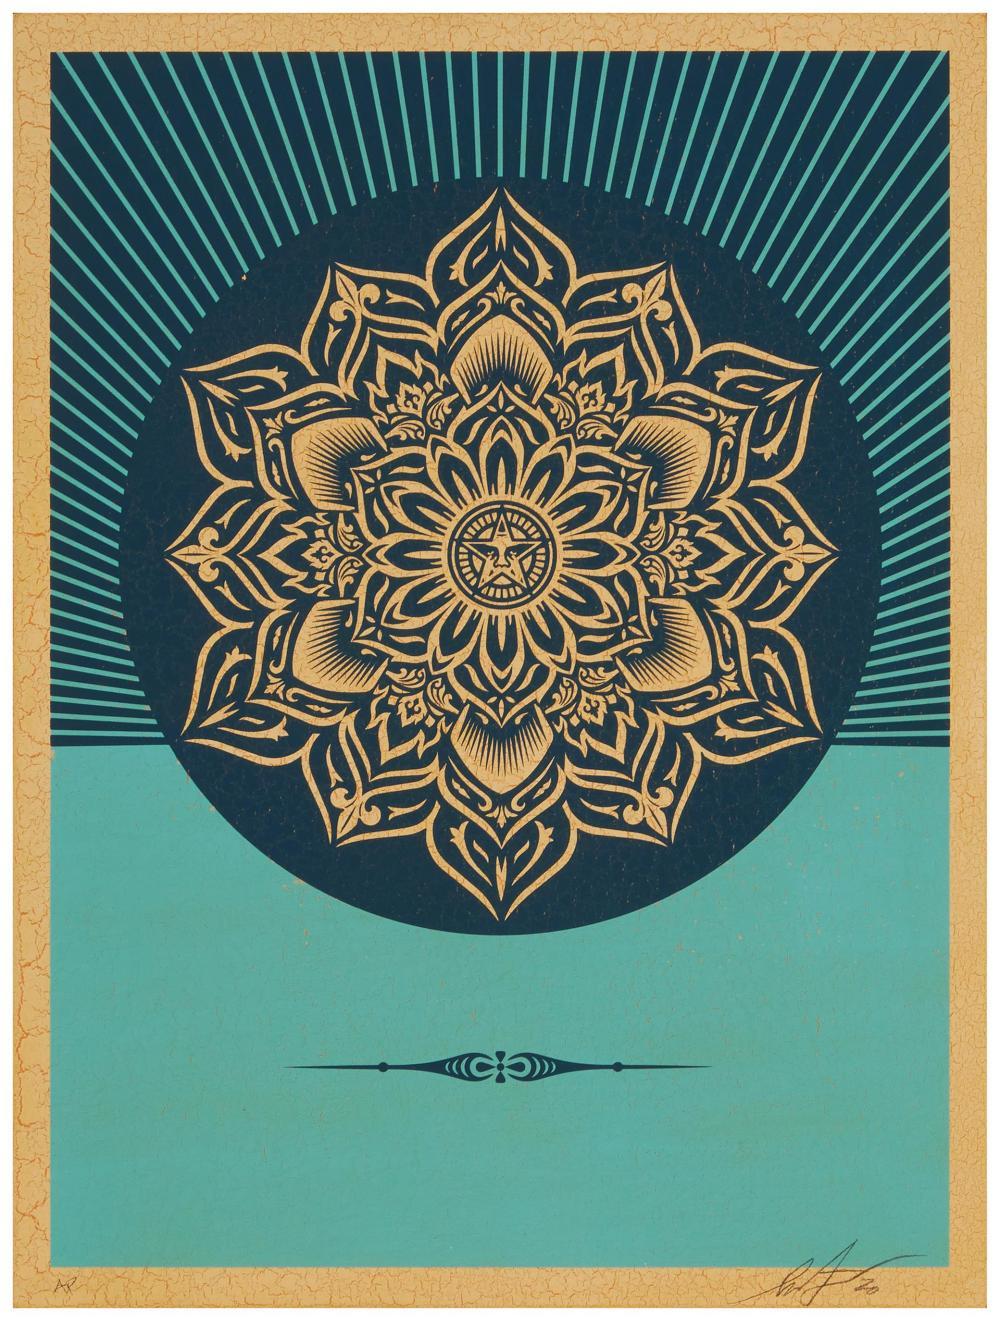 "Shepard Fairey, (b. 1970, American), OBEY Burrard Mandala, 2020, Color screenprint on wood panel, 24"" H x 18"" W"